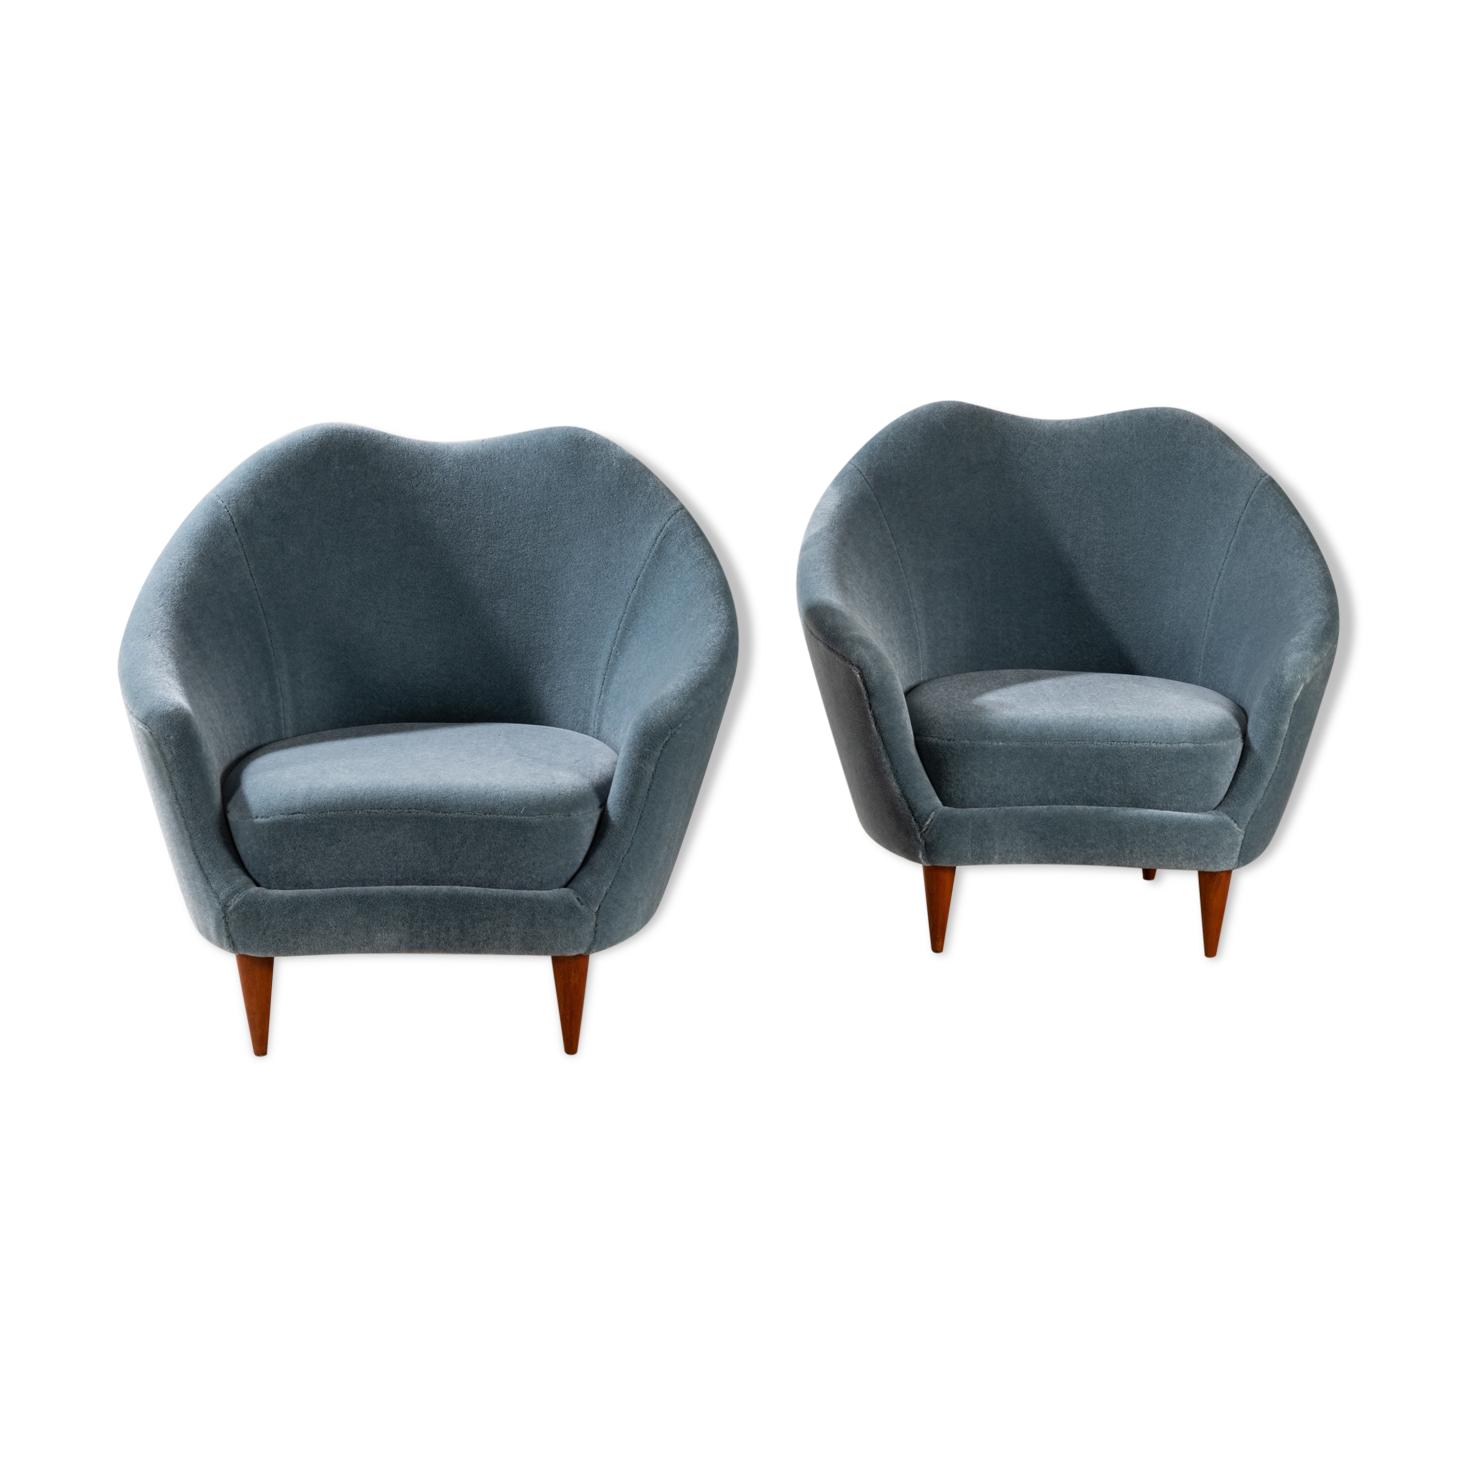 Paire de fauteuils de Federico Munari, Italie vers 1960